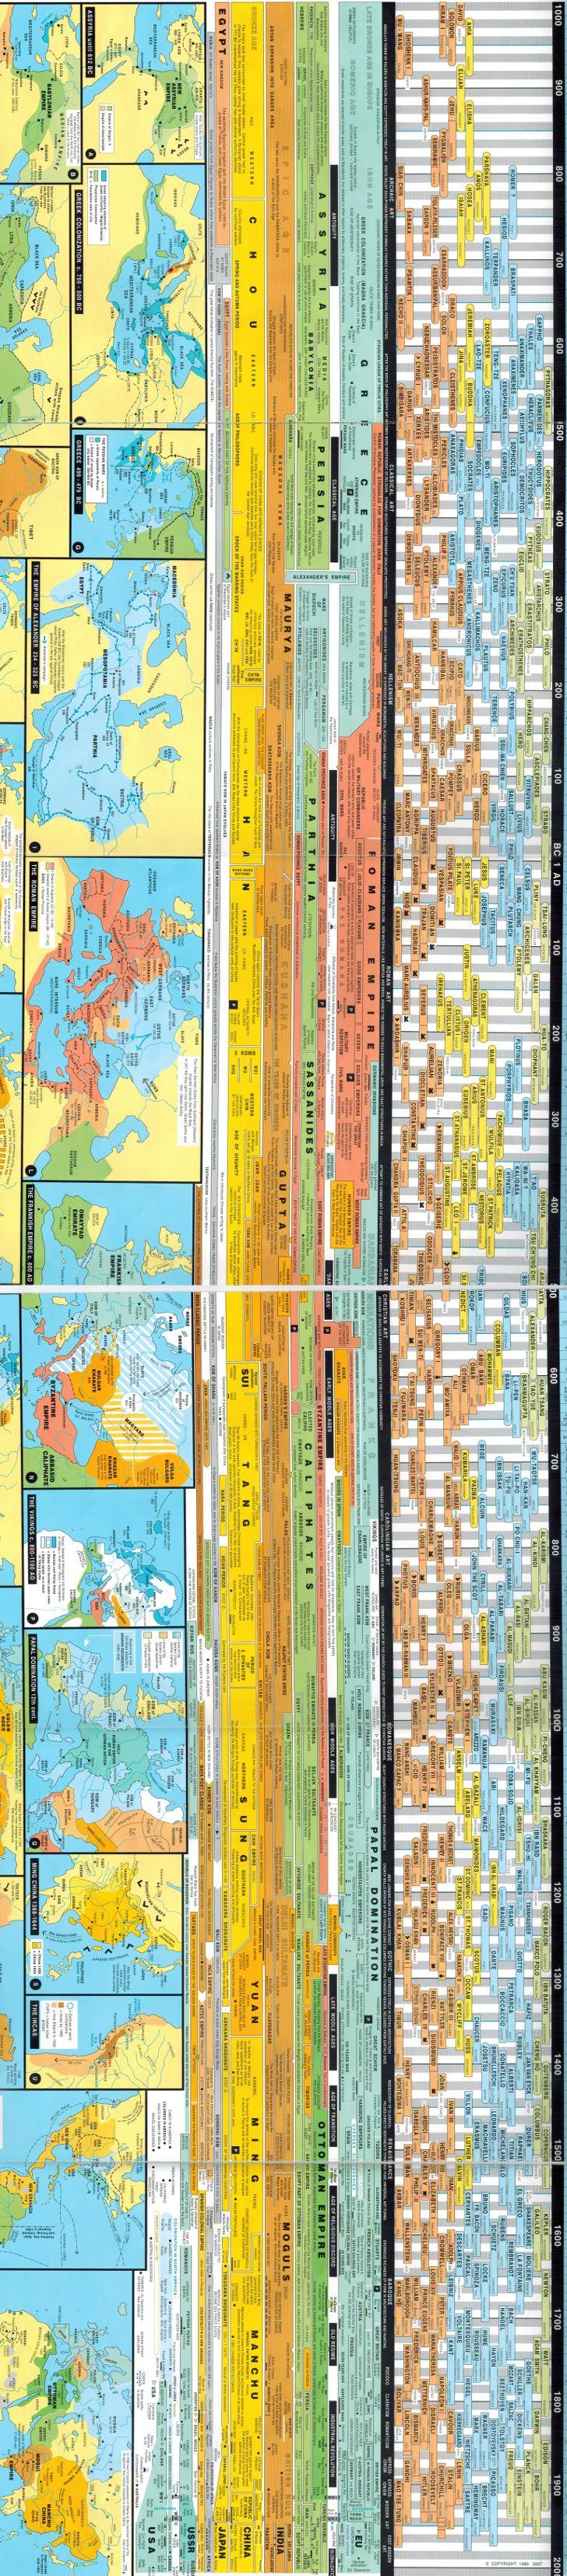 World History Chart by Andreas Nothiger | World History Charts